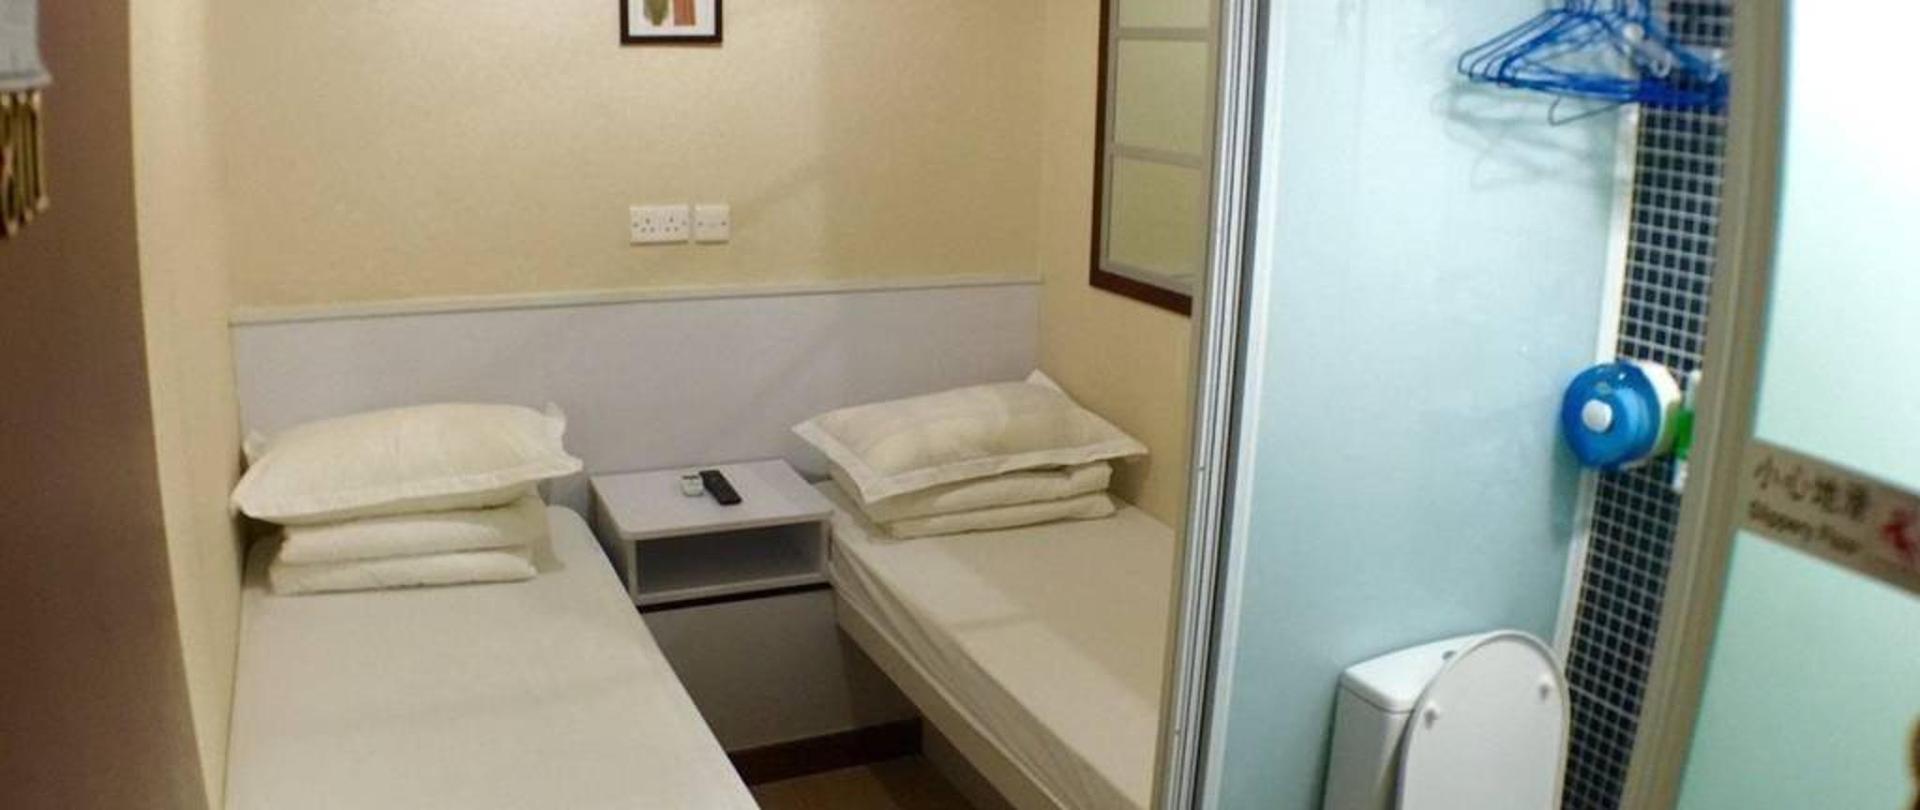 twin-beds-lv8-3.jpg